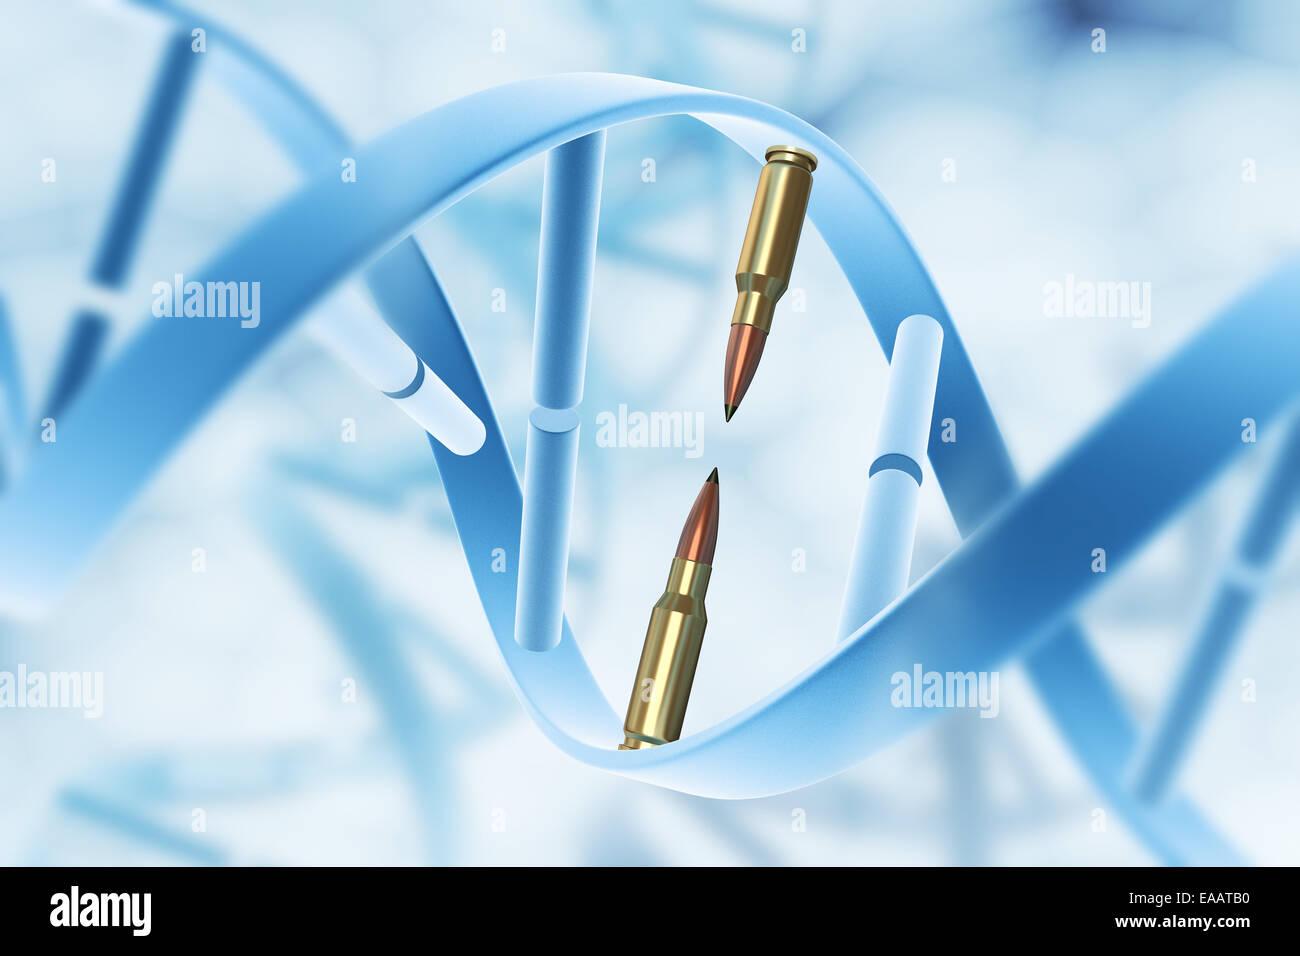 Aggression and destruction gene - Stock Image